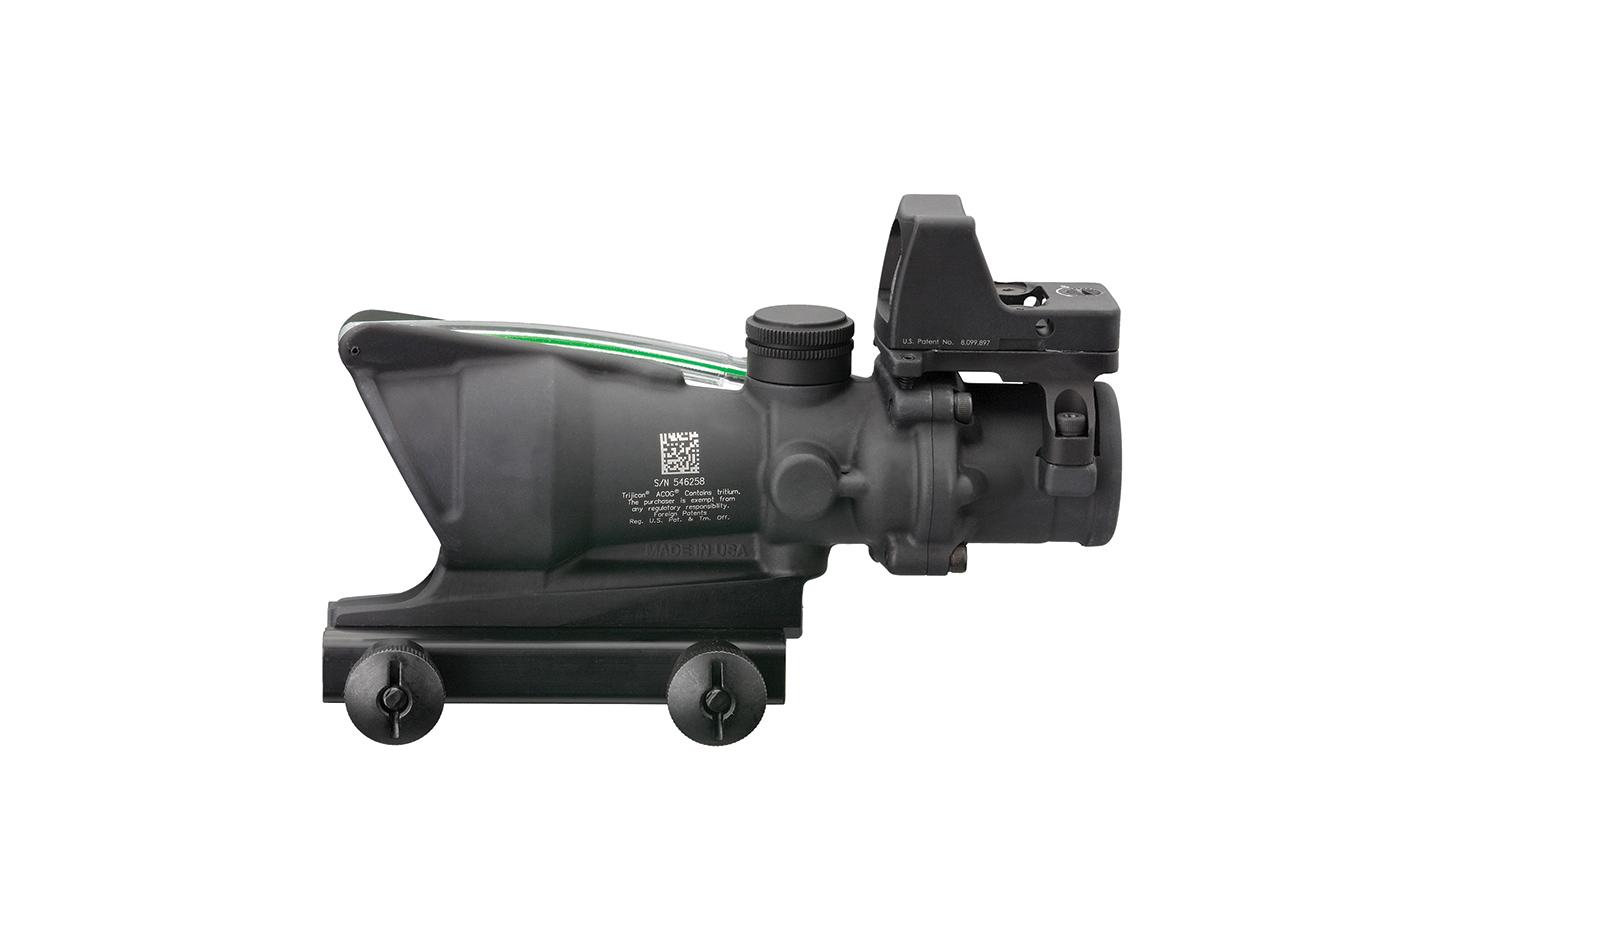 TA31-C-100552 angle 2